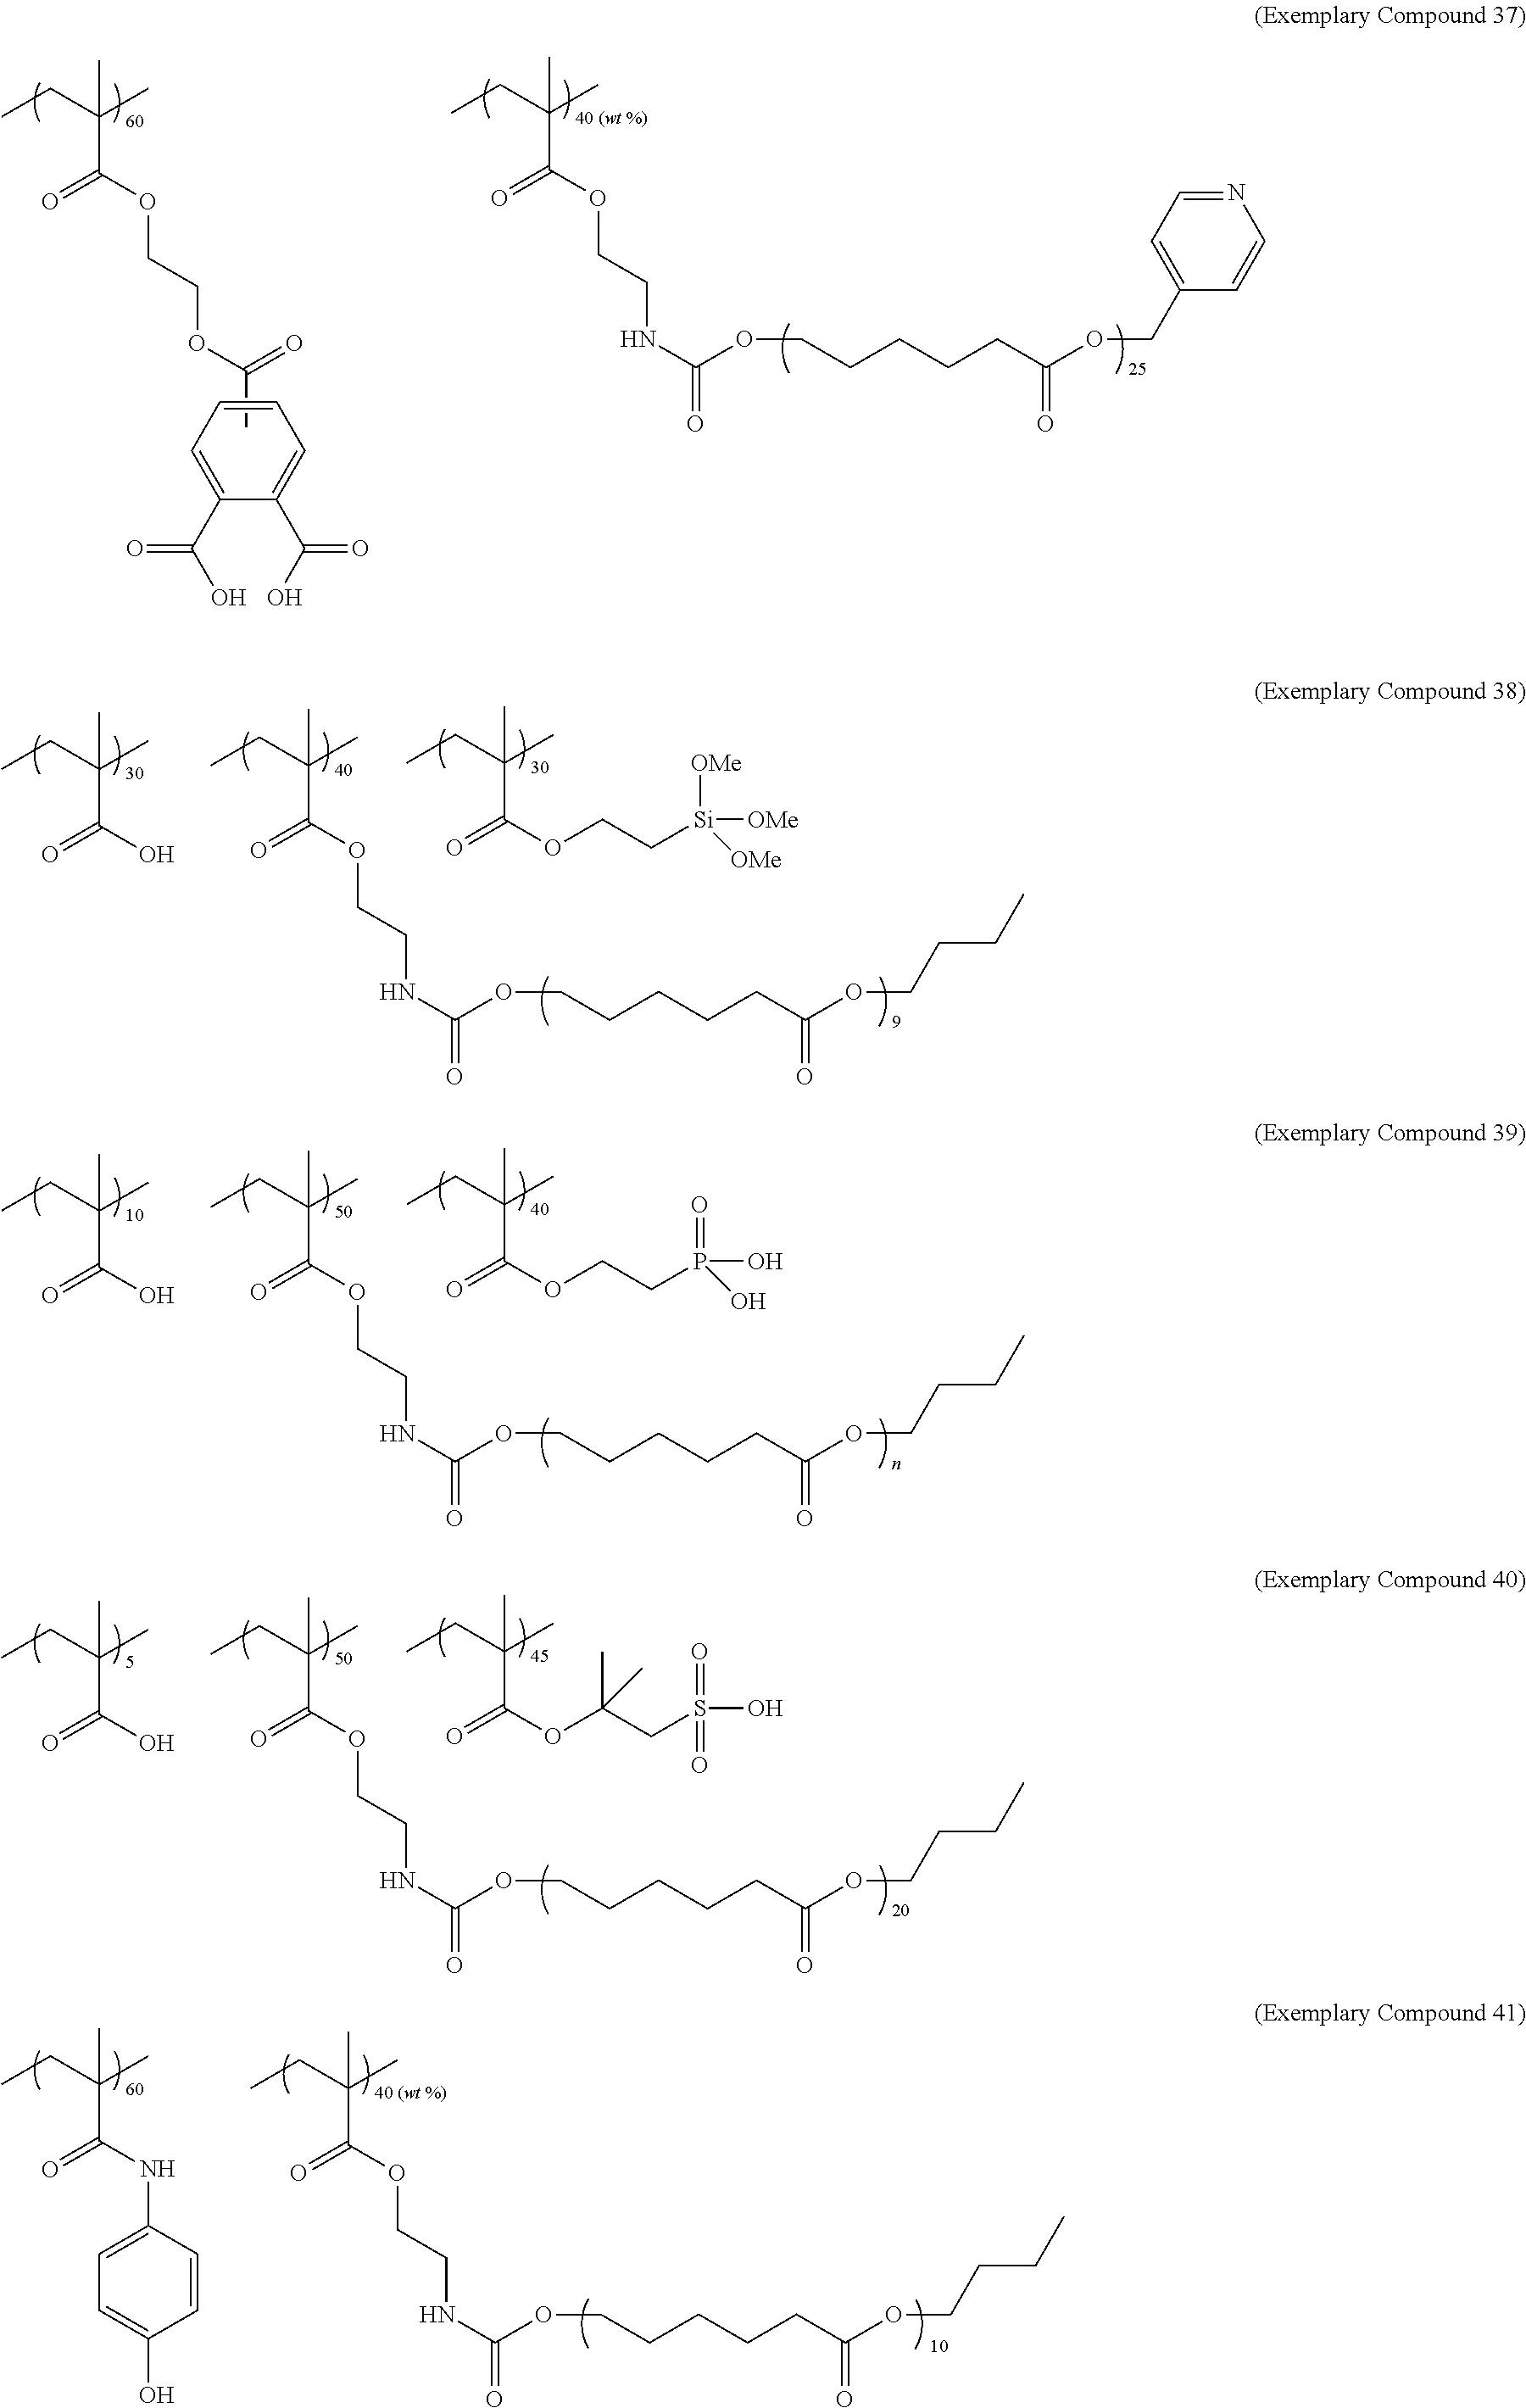 us8278386b2